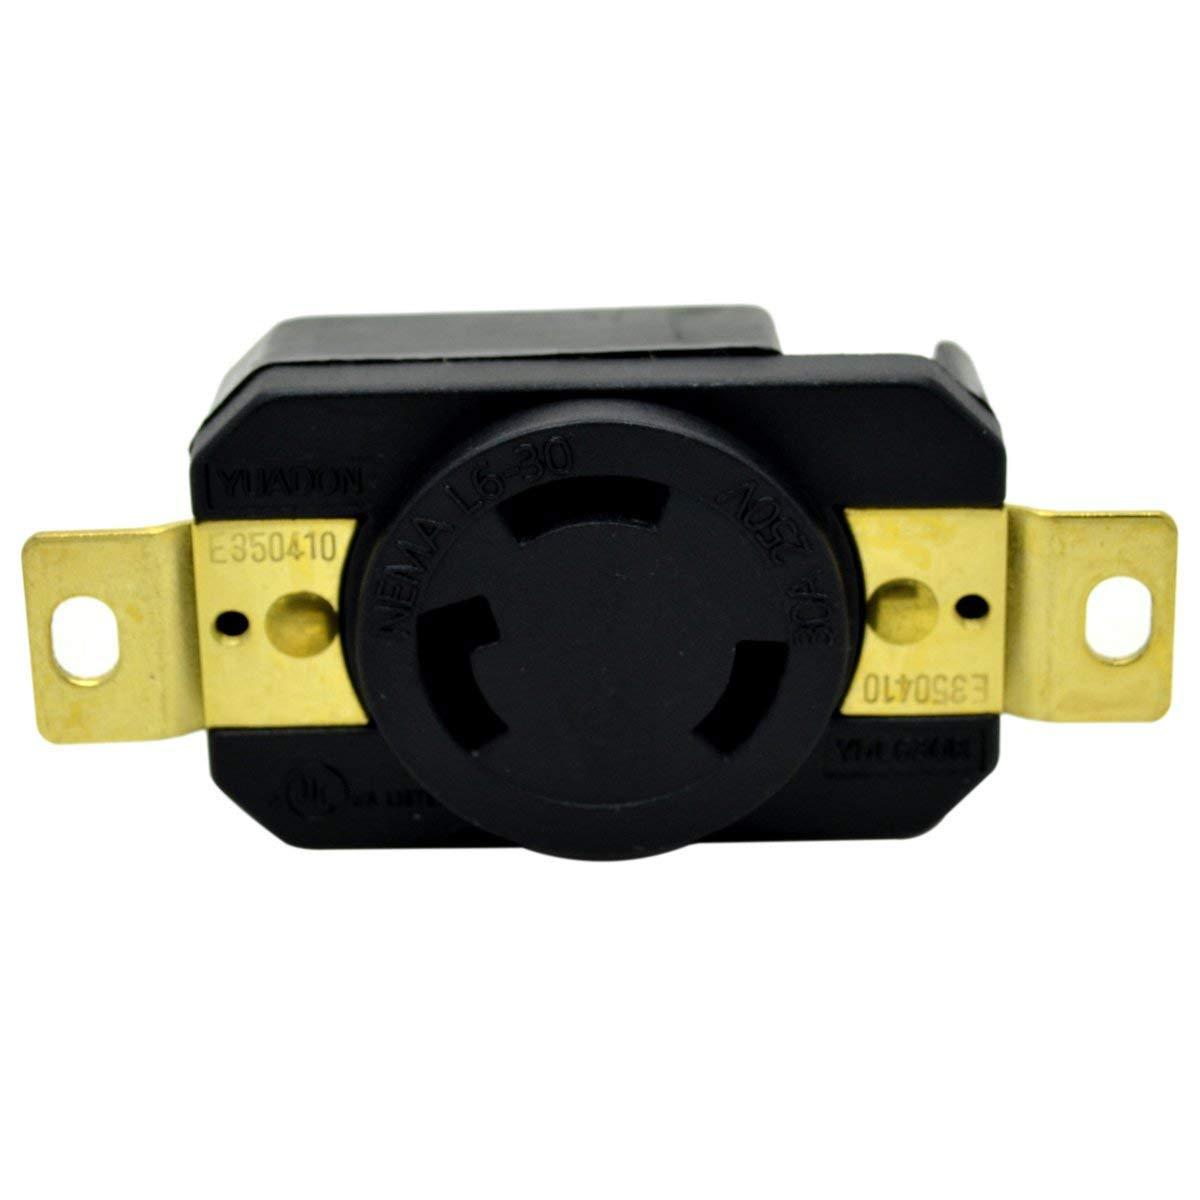 YuaDon NEMA L6-30R General-purpose Twist Locking Receptacle 2 Pole,3 Wire,250Volt AC,30 Amp,Grounding by YuaDon (Image #1)